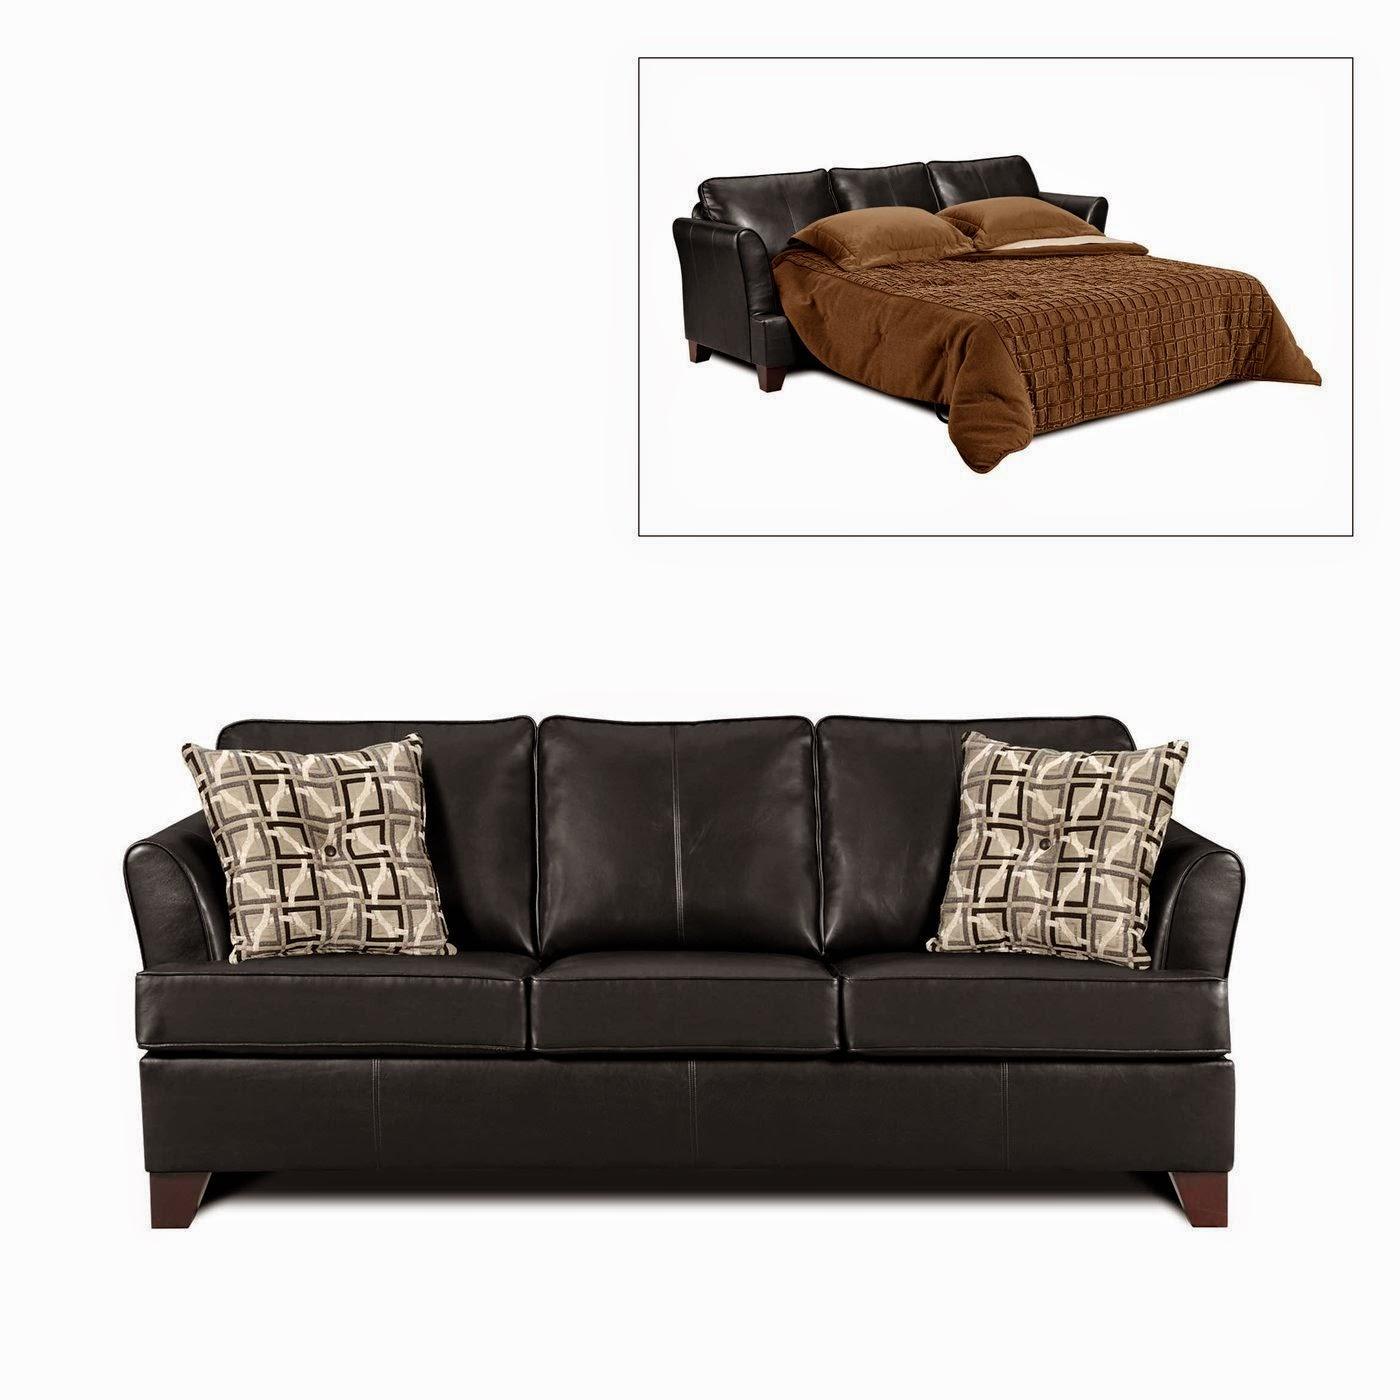 black leather sofa: black leather sleeper sofa